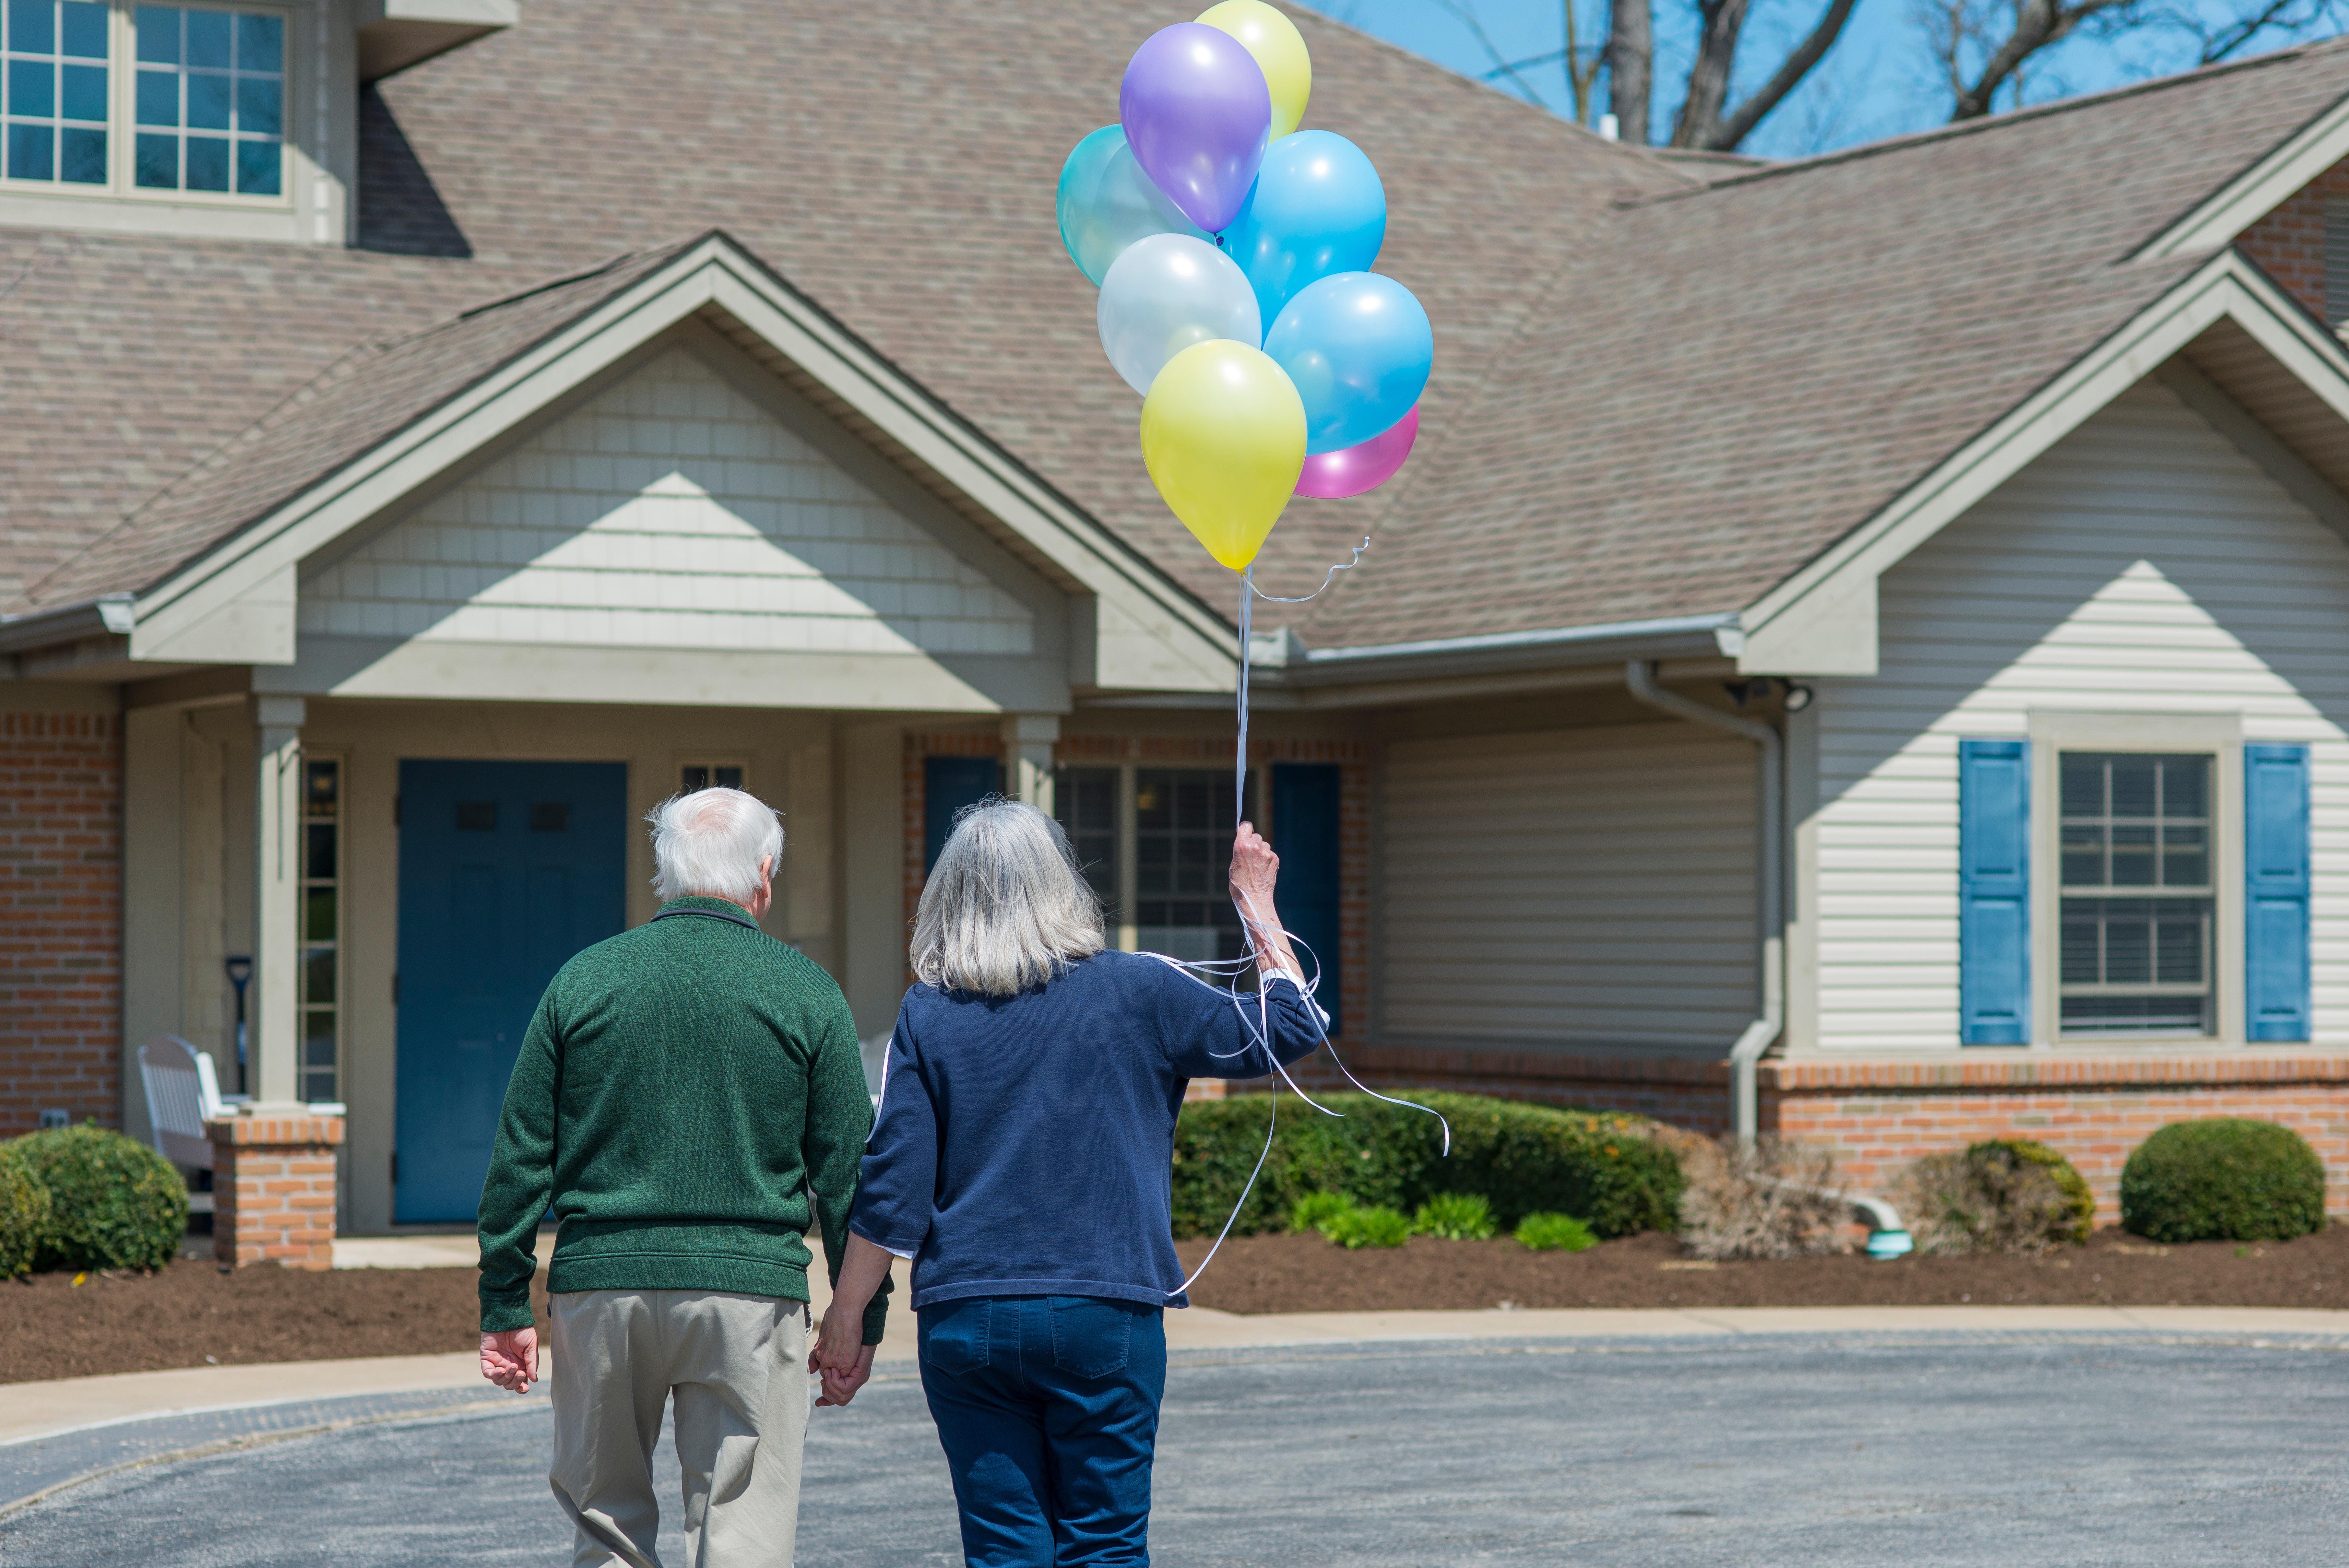 retirement-dreams-balloons